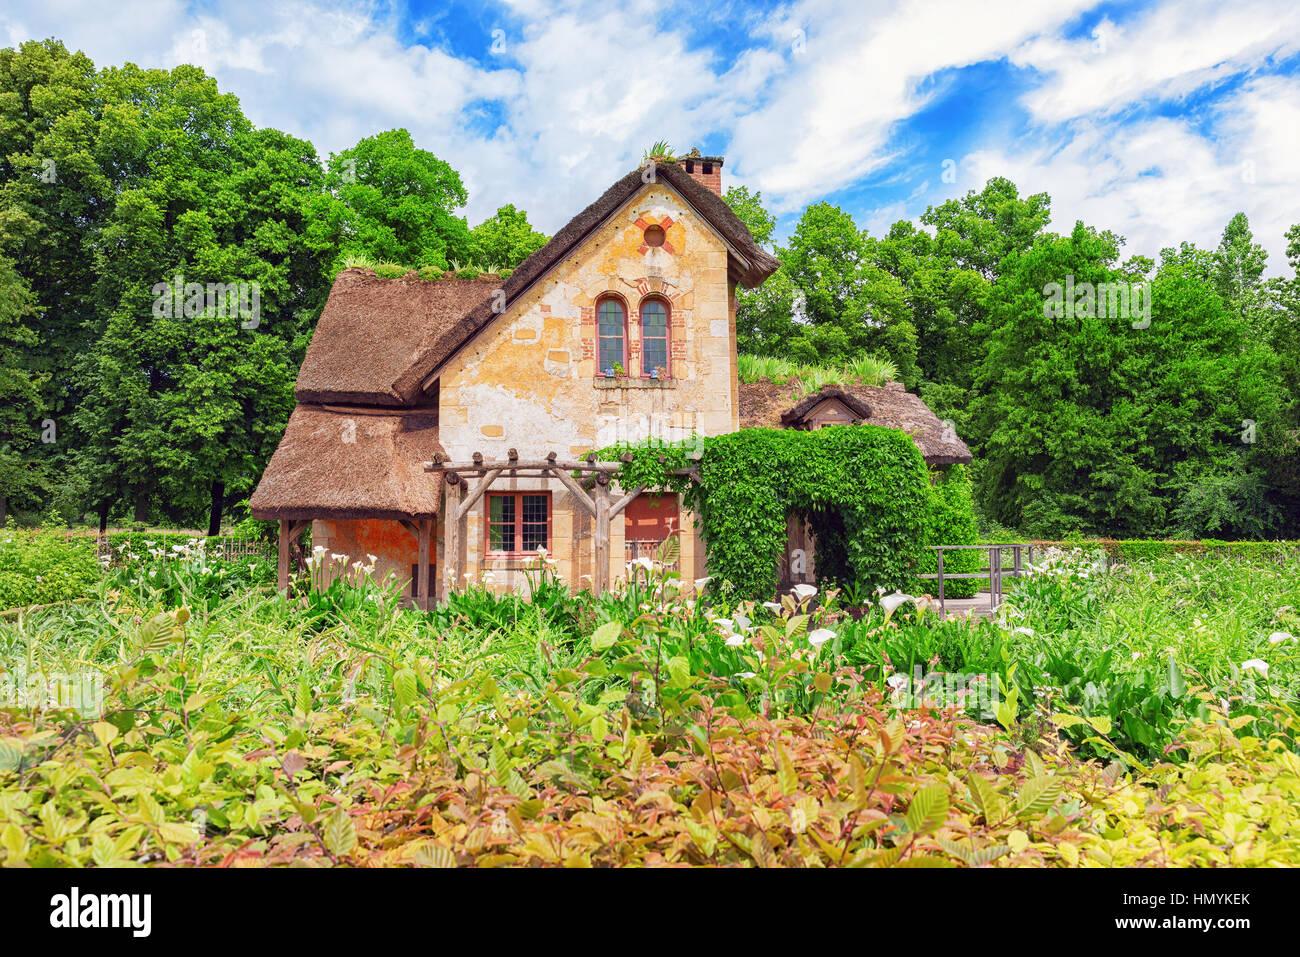 VERSAILLES, FRANCE - JULY 02, 2016 : Landscape of hamlet Queen Marie Antoinette's estate near Versailles Palace. - Stock Image